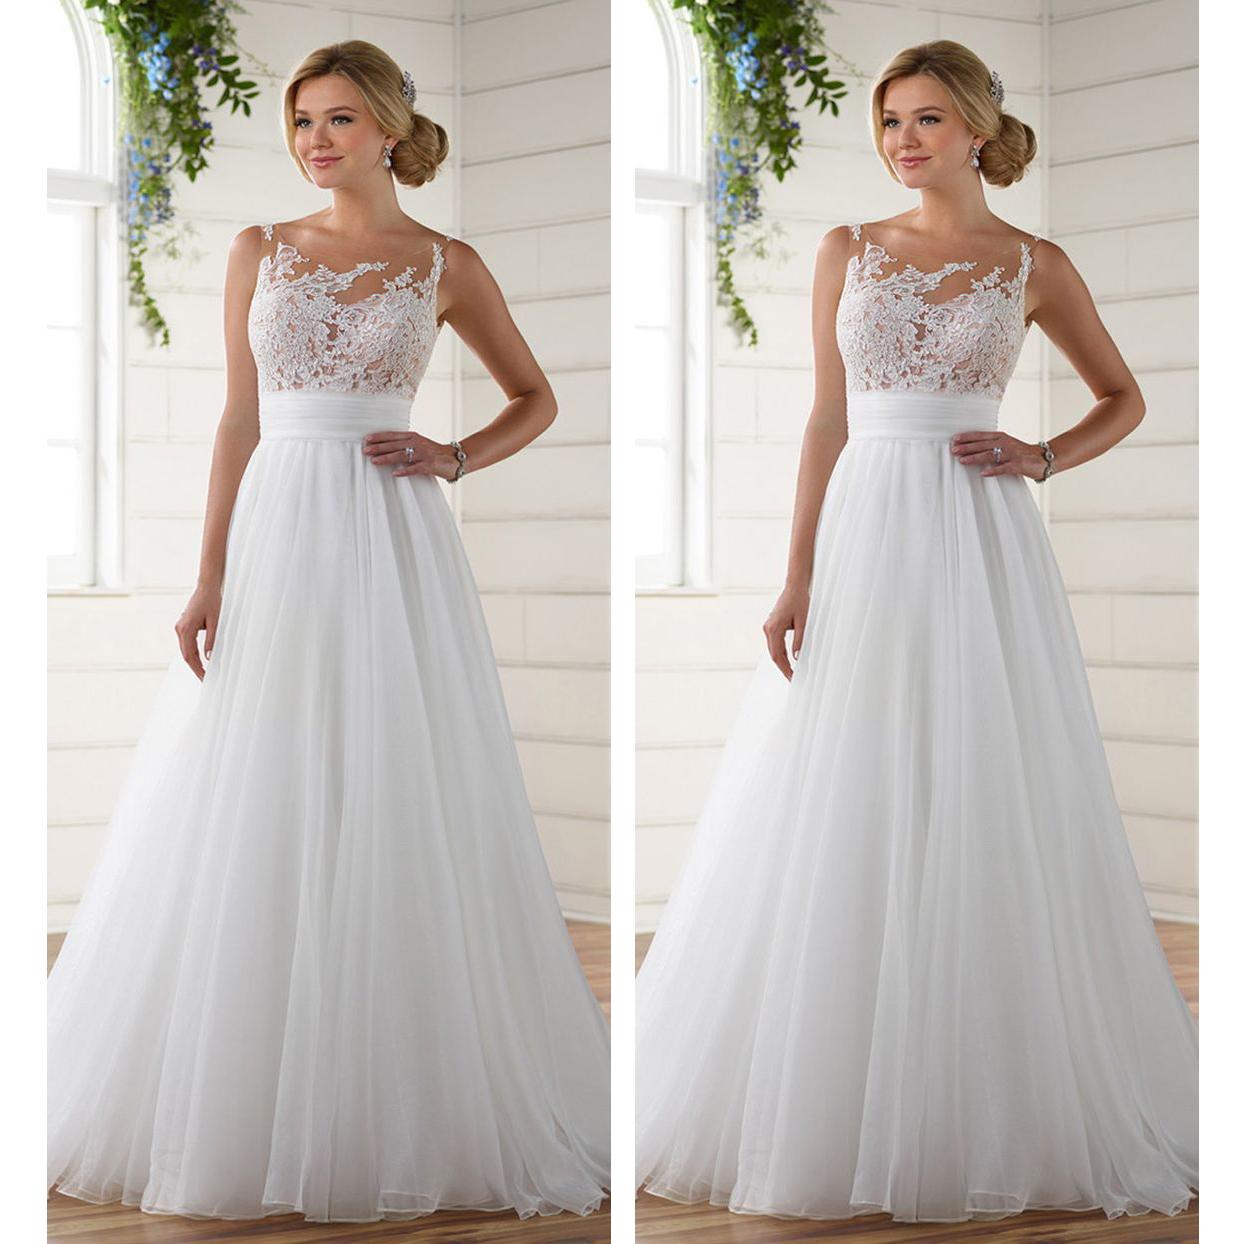 2018 Vintage Lace Wedding Dress Sheer Scoop Neck Chiffon Floor ...